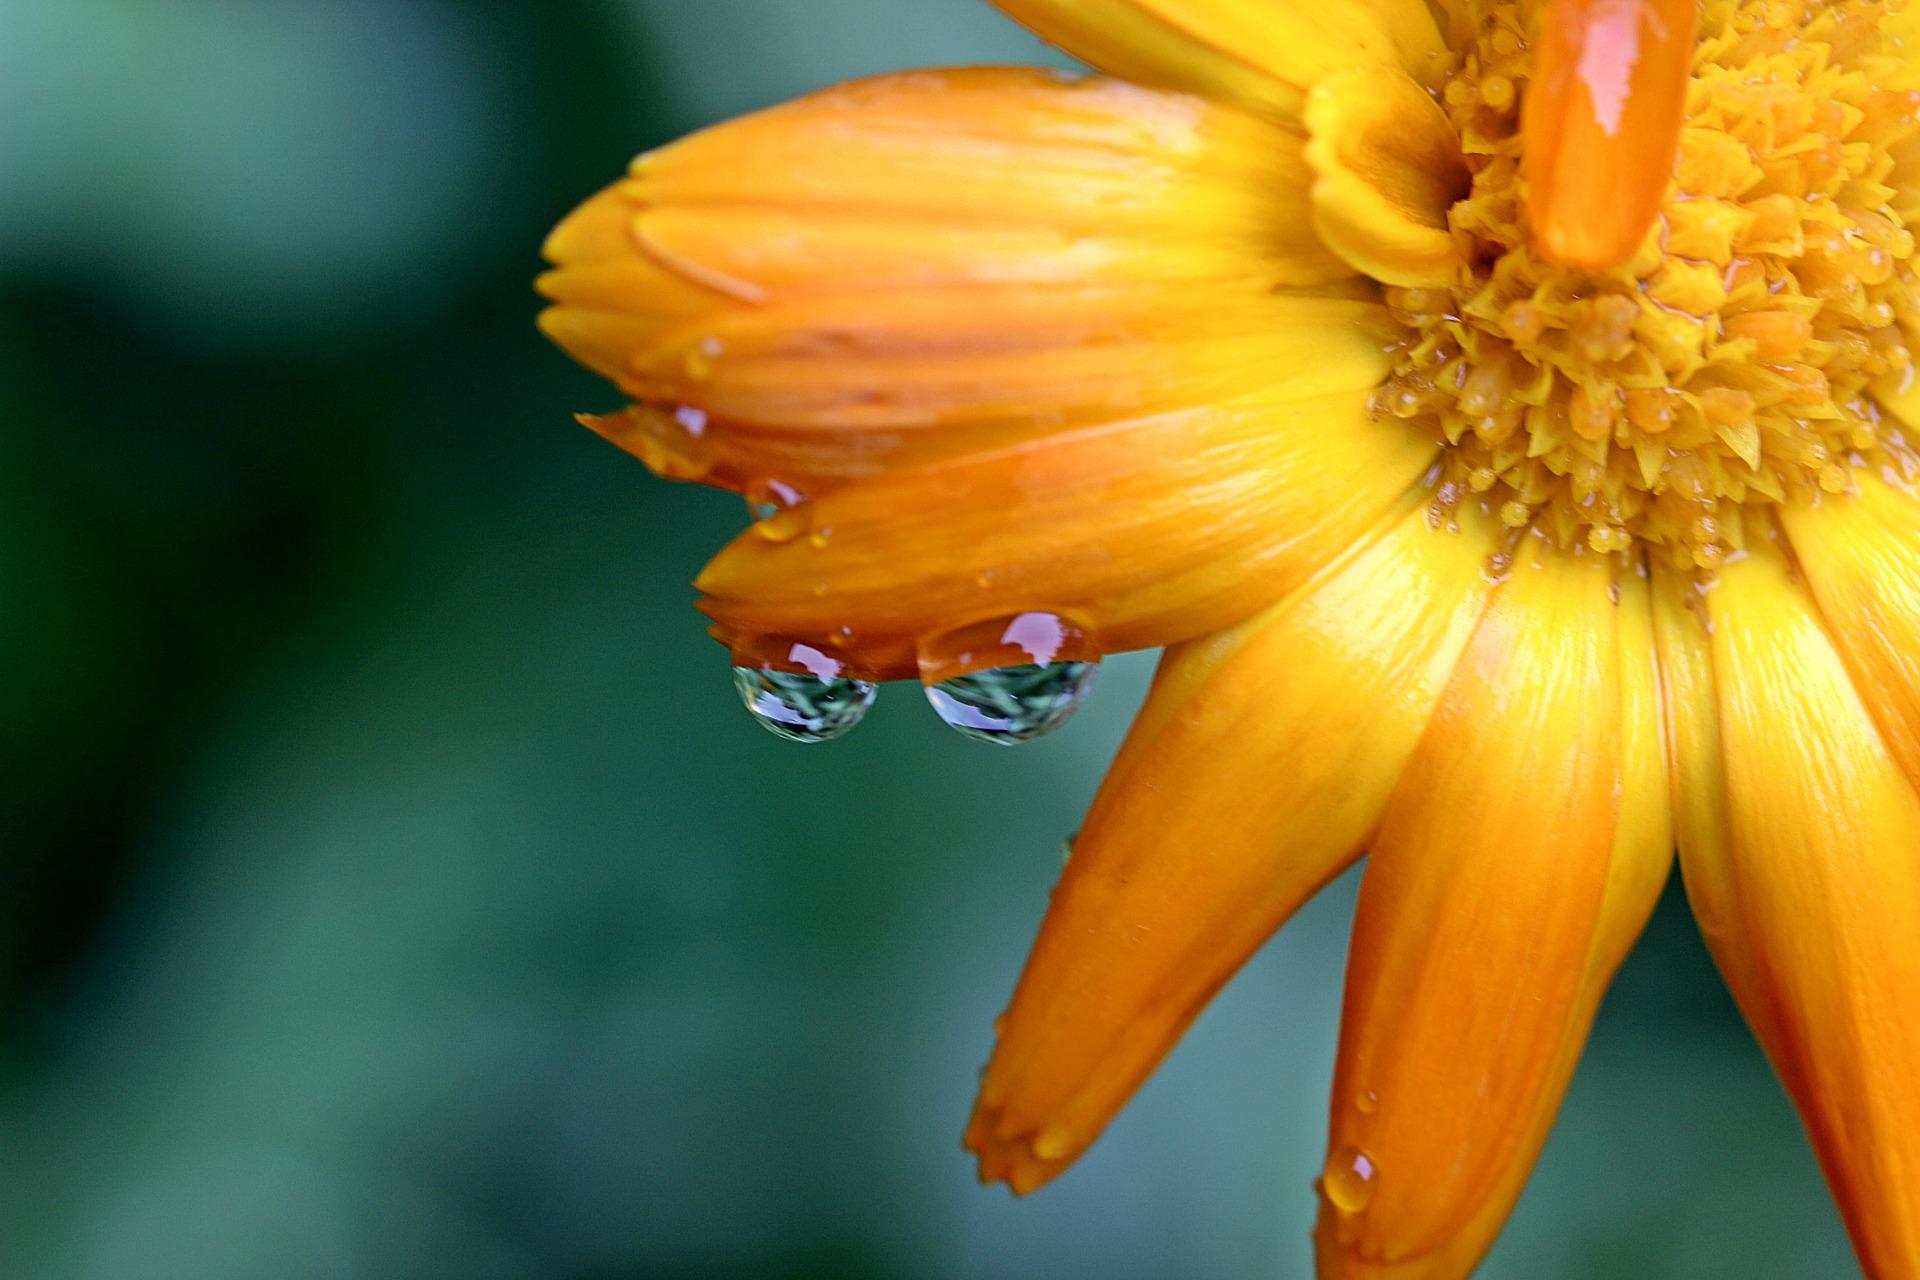 marigold-1568620_1920